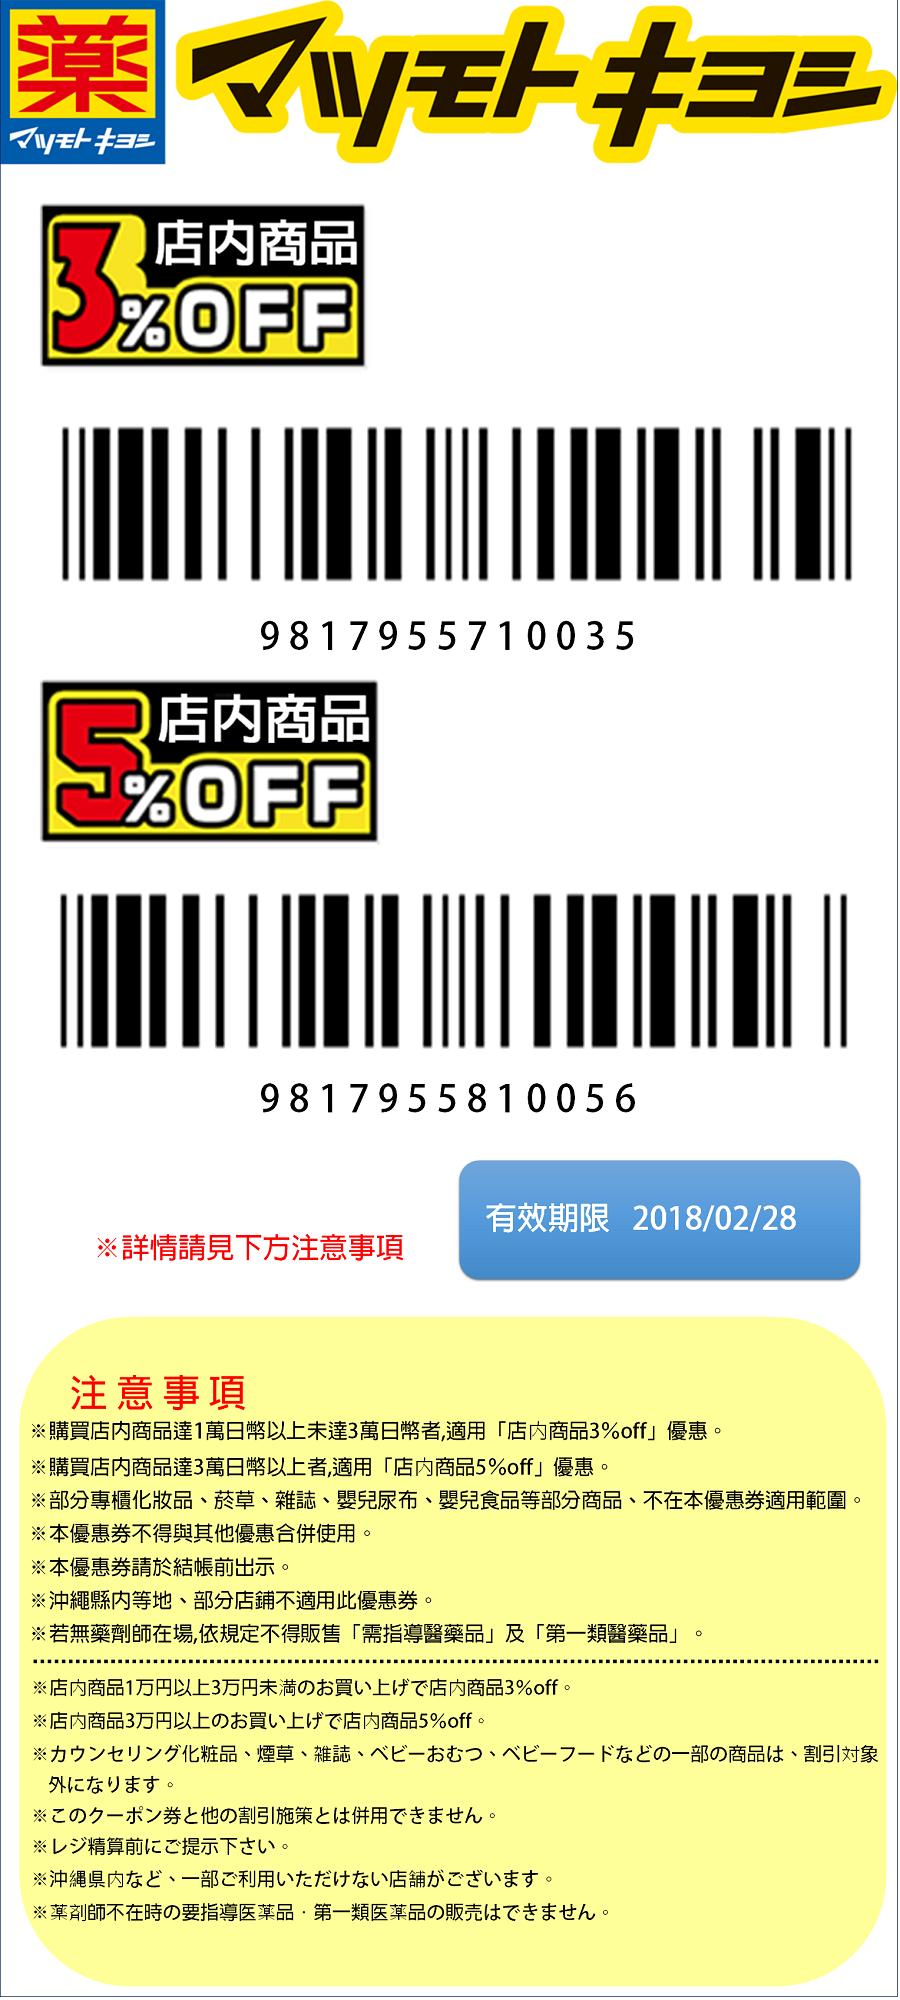 jimmy用coupon0310更新(白900X2000)